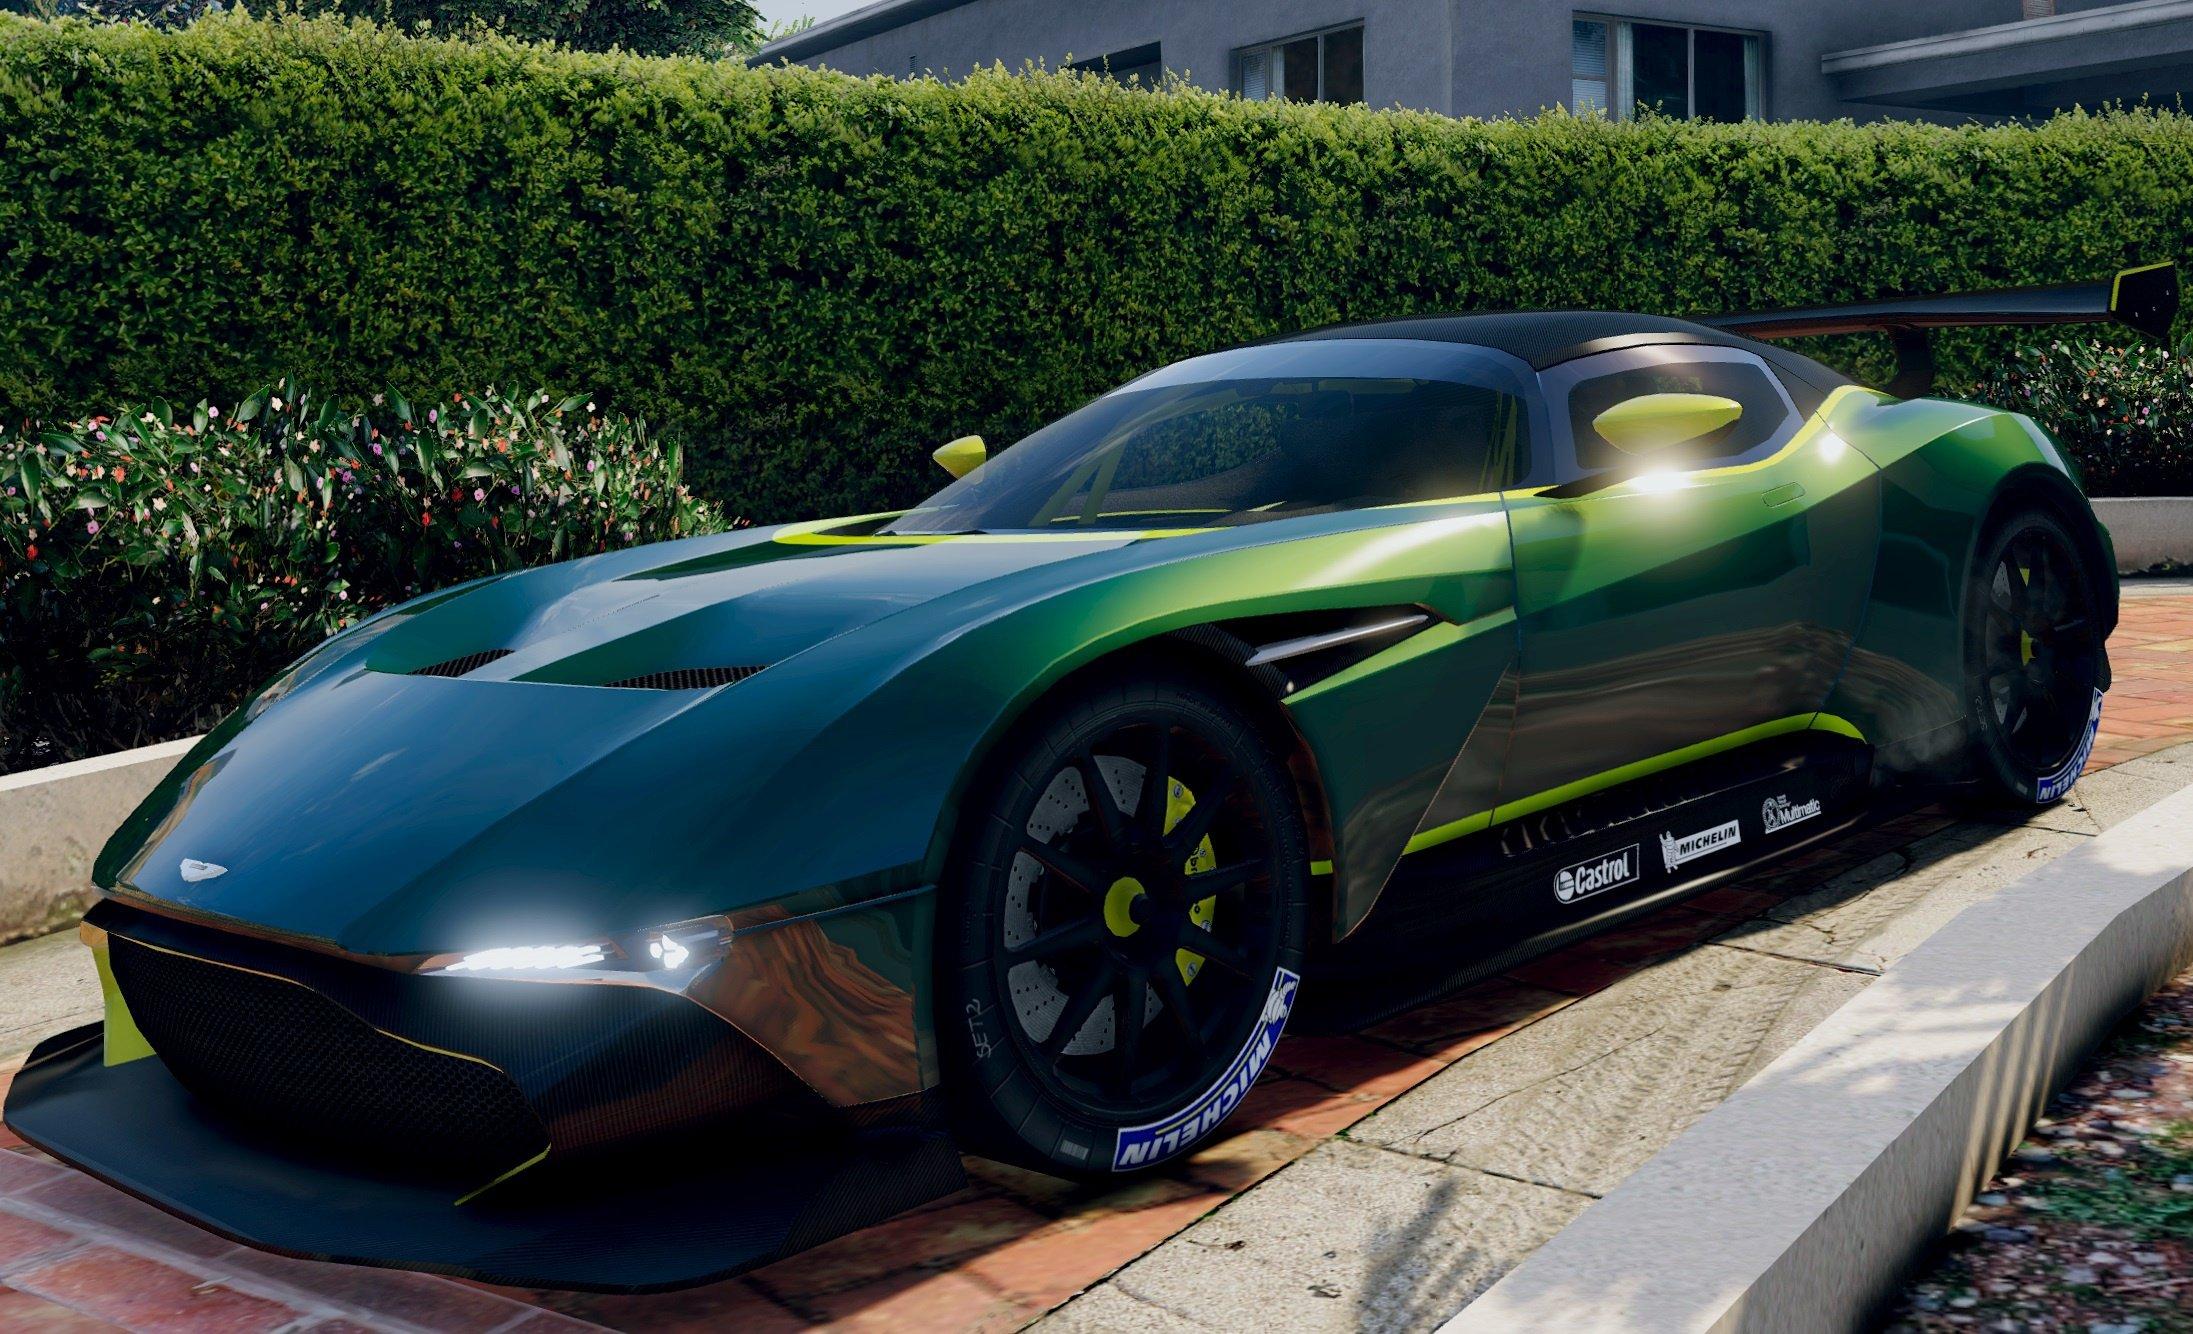 Cheetah Gta V In Real Life Aston Martin Vulcan 20...